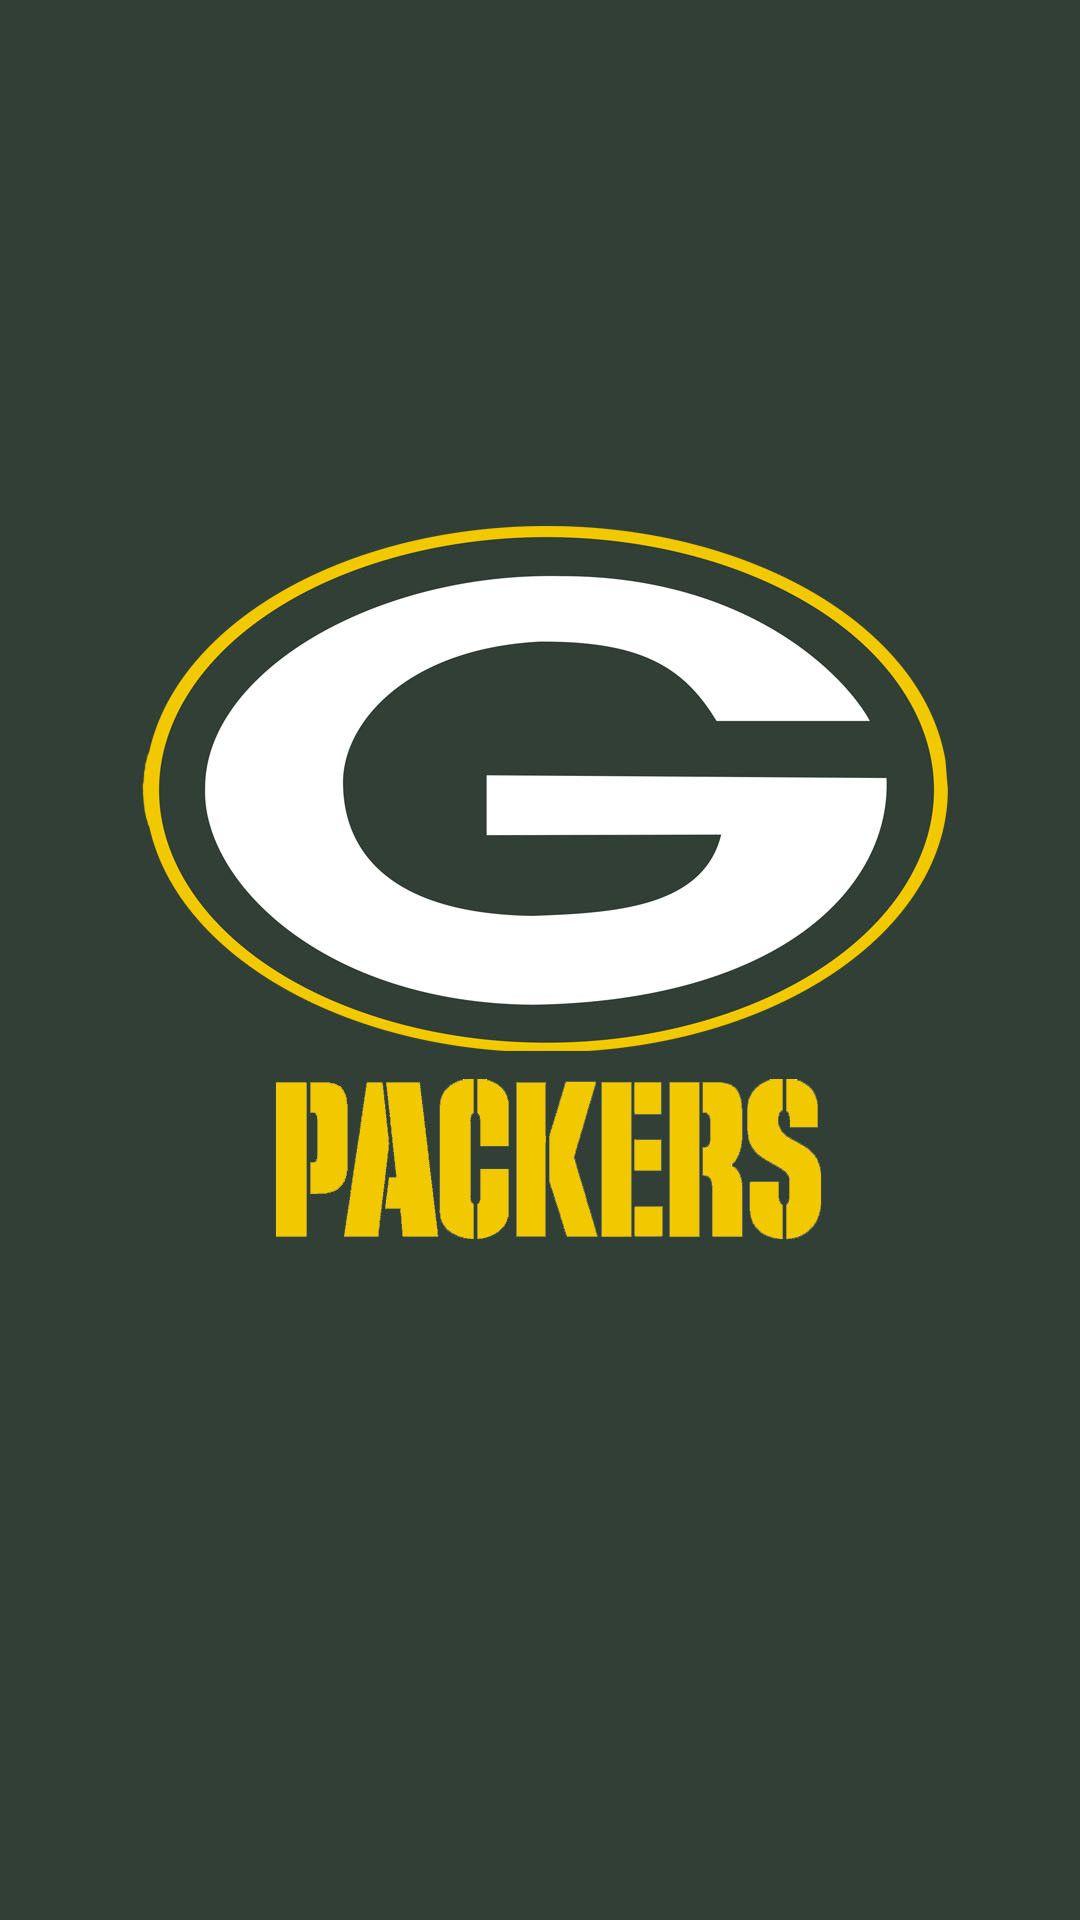 Logo Green Bay Packers Wallpaper In 2020 Green Bay Packers Wallpaper Green Bay Packers Green Bay Packers Clothing